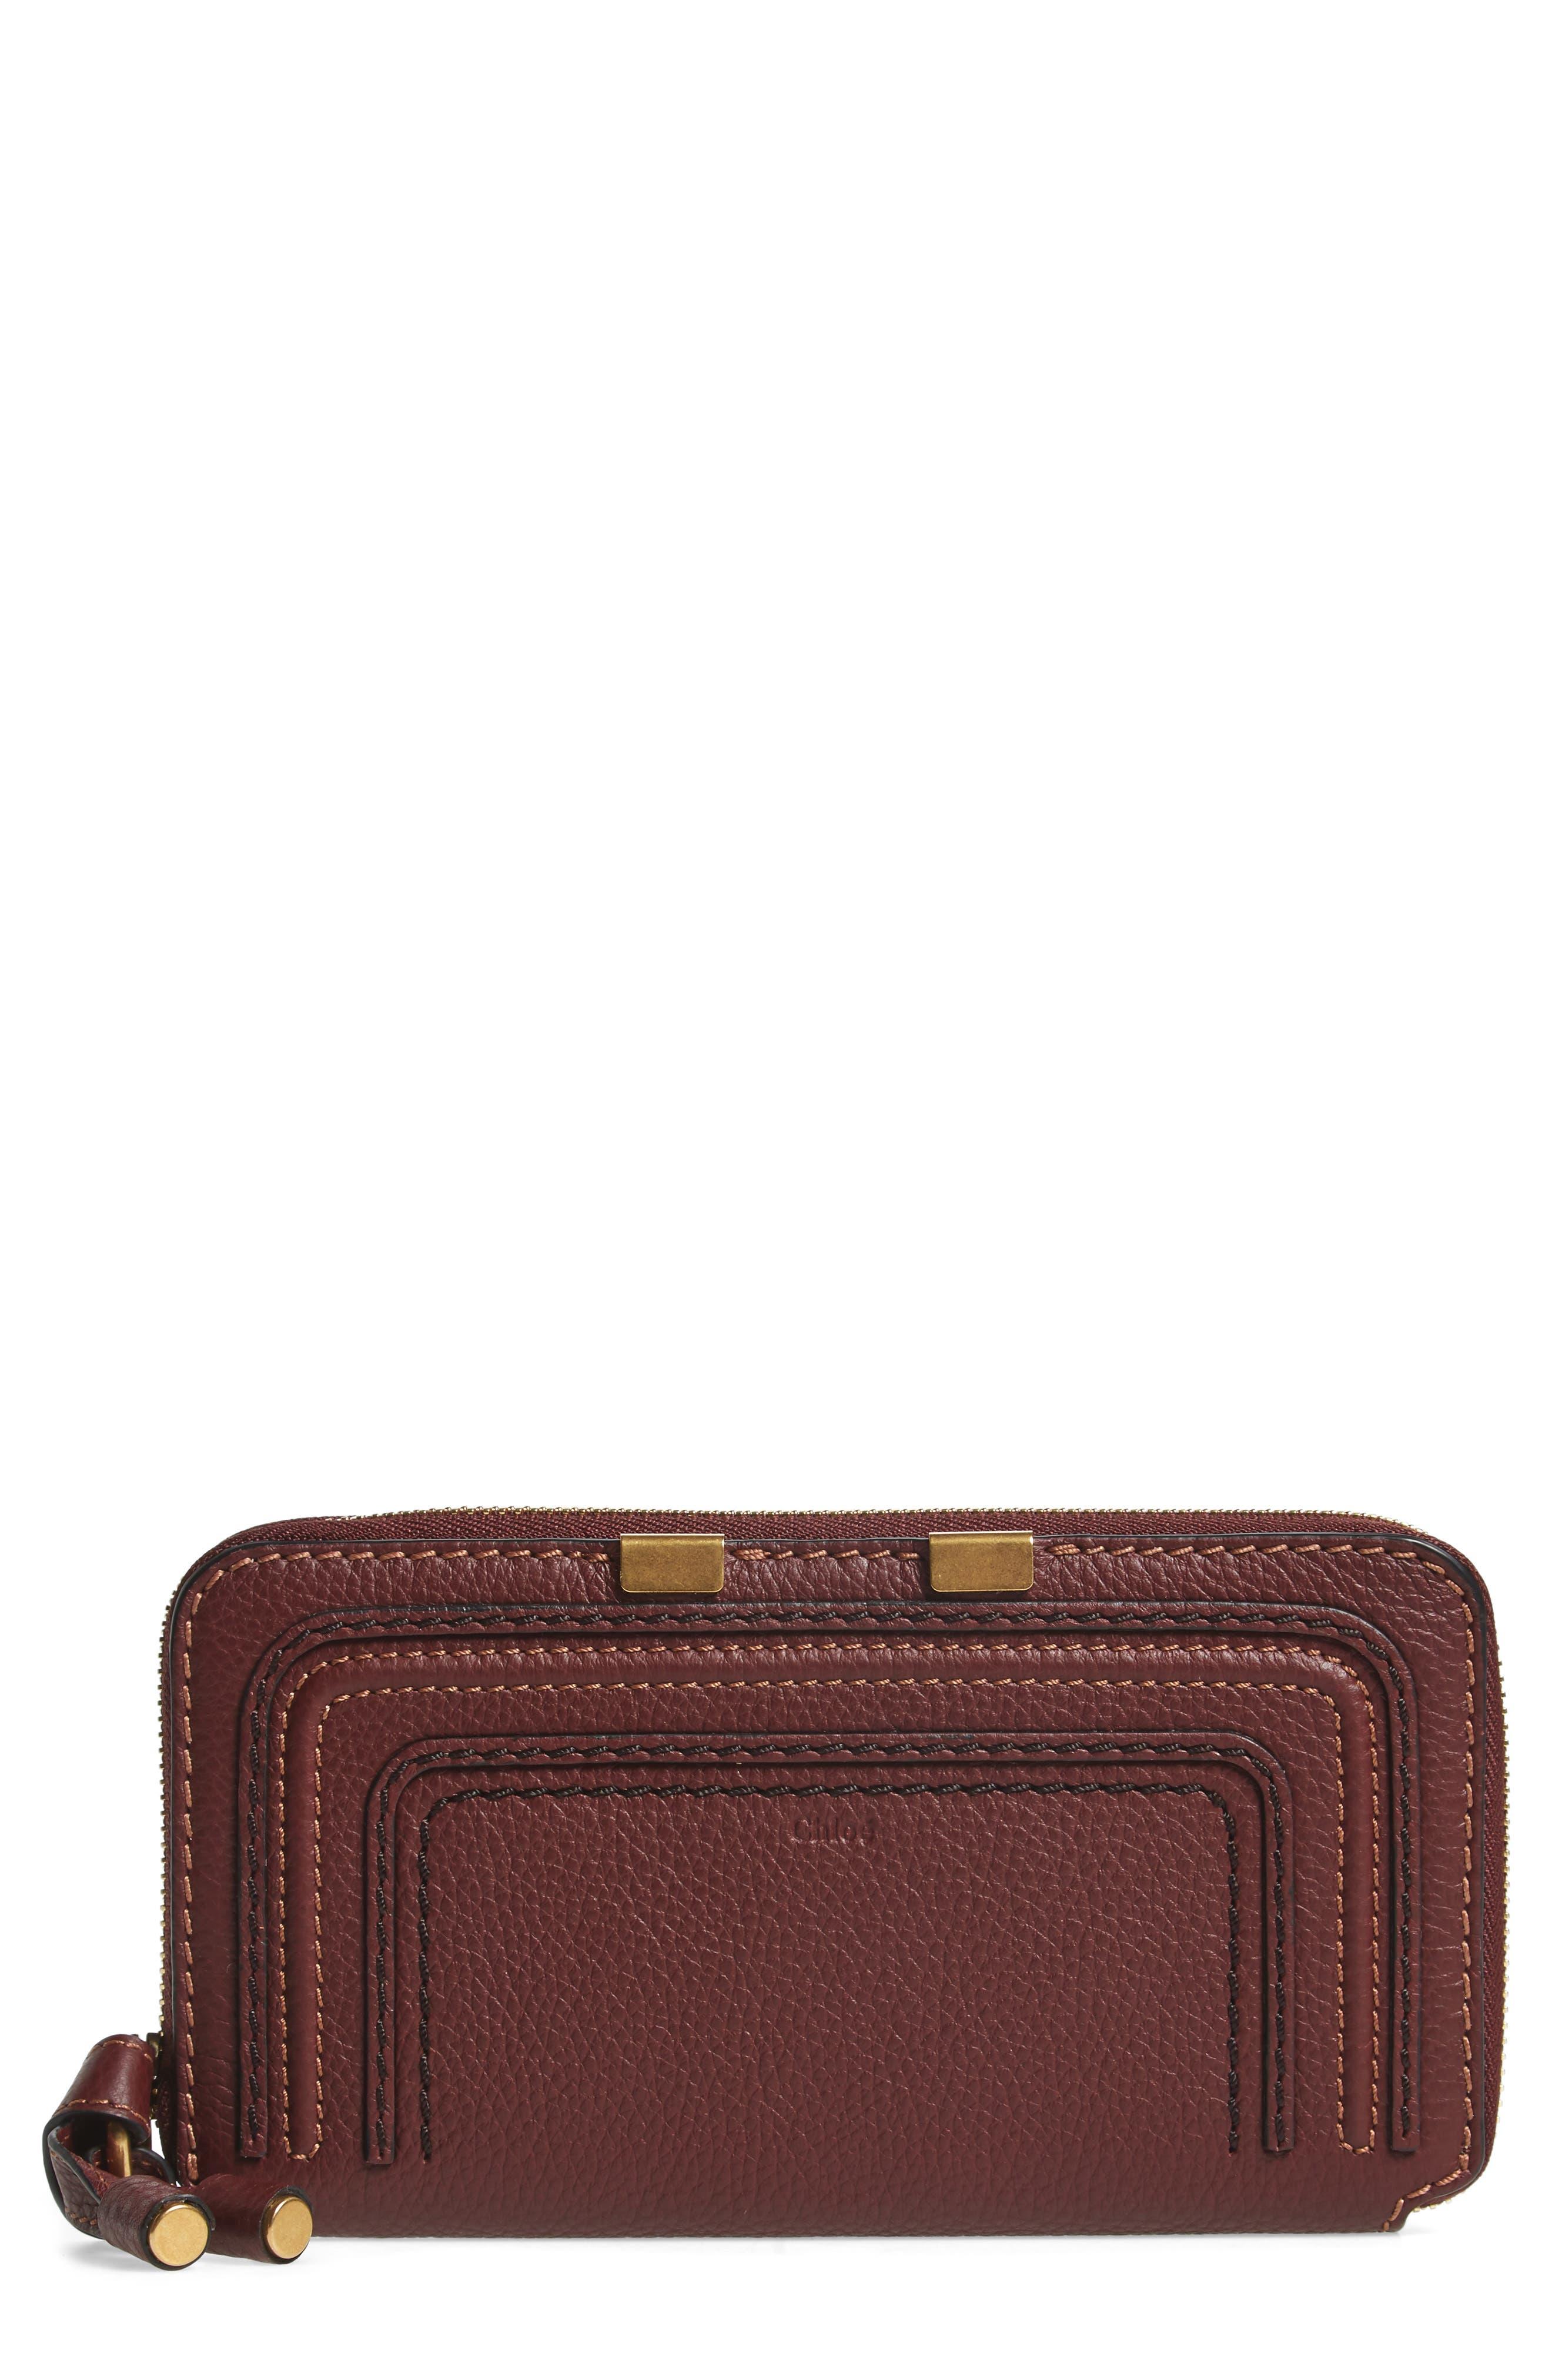 CHLOÉ Marcie - Long Zip Around Wallet